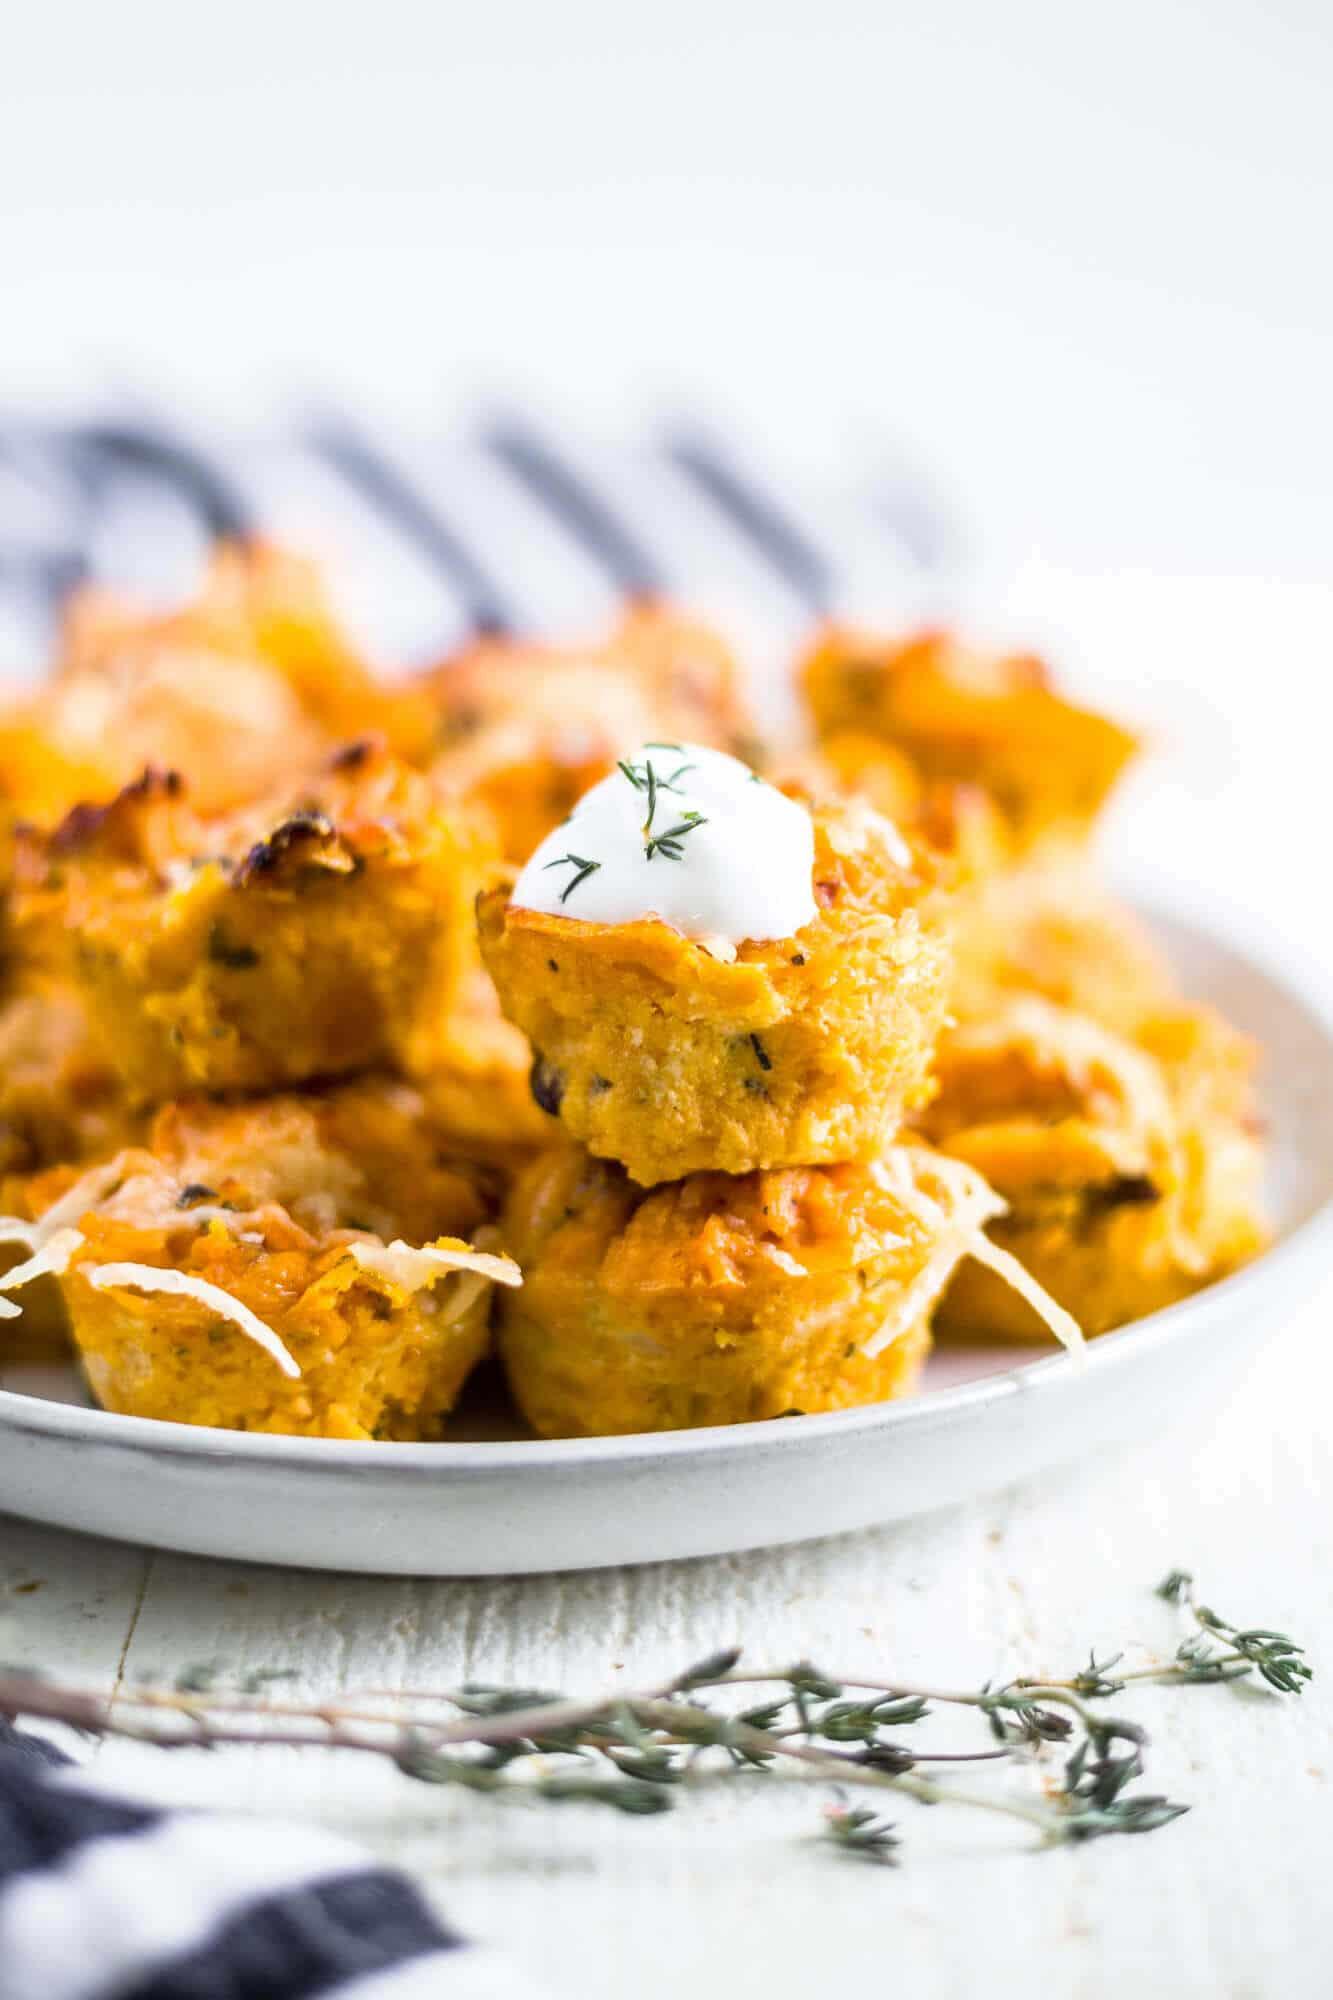 sweet potato puffs on a white serving plate